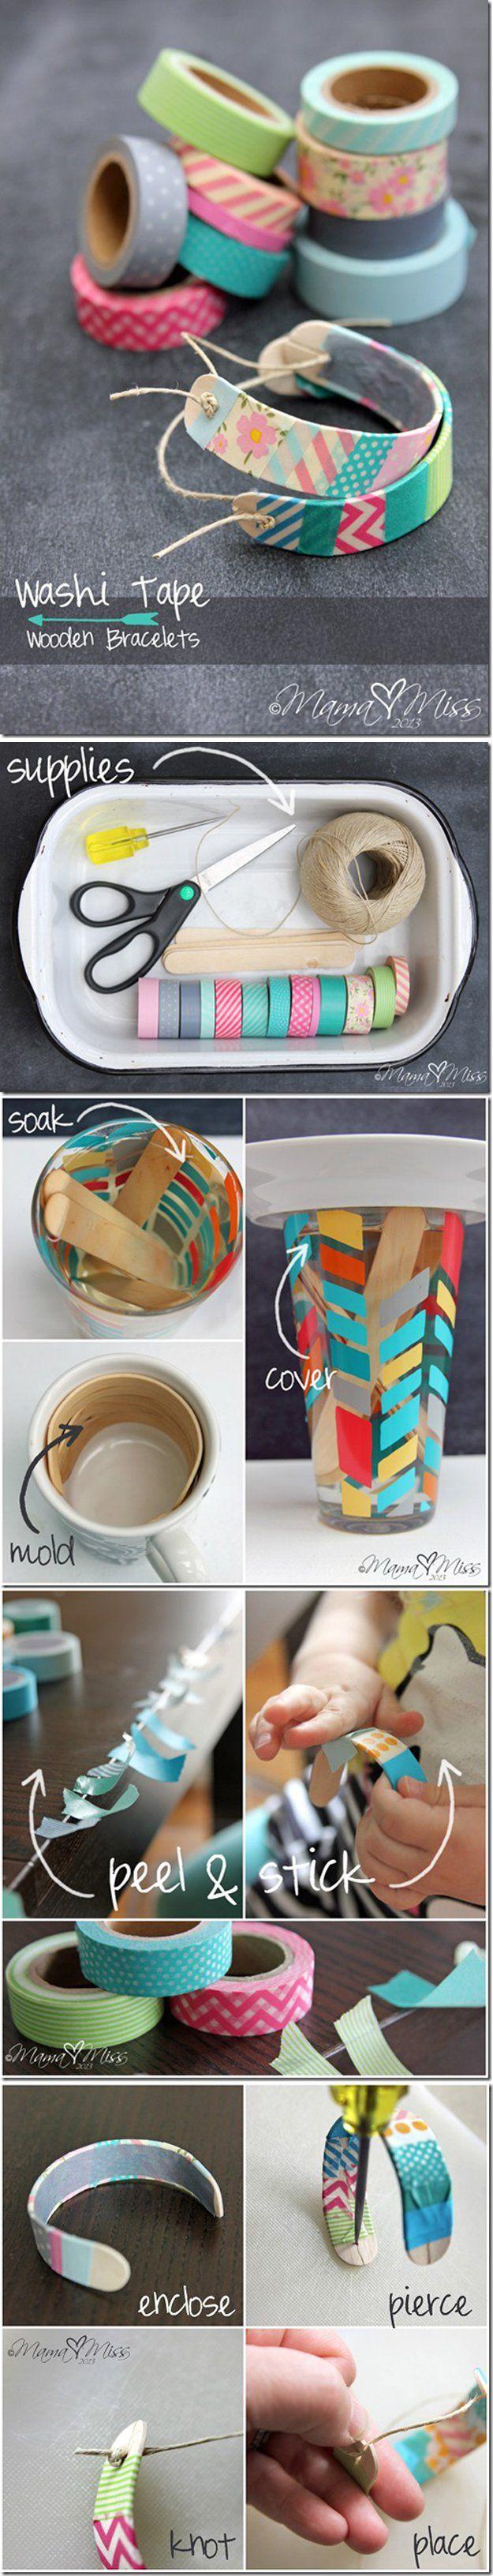 100 Creative Ways to Use Washi Tape | DIY CRAFTS